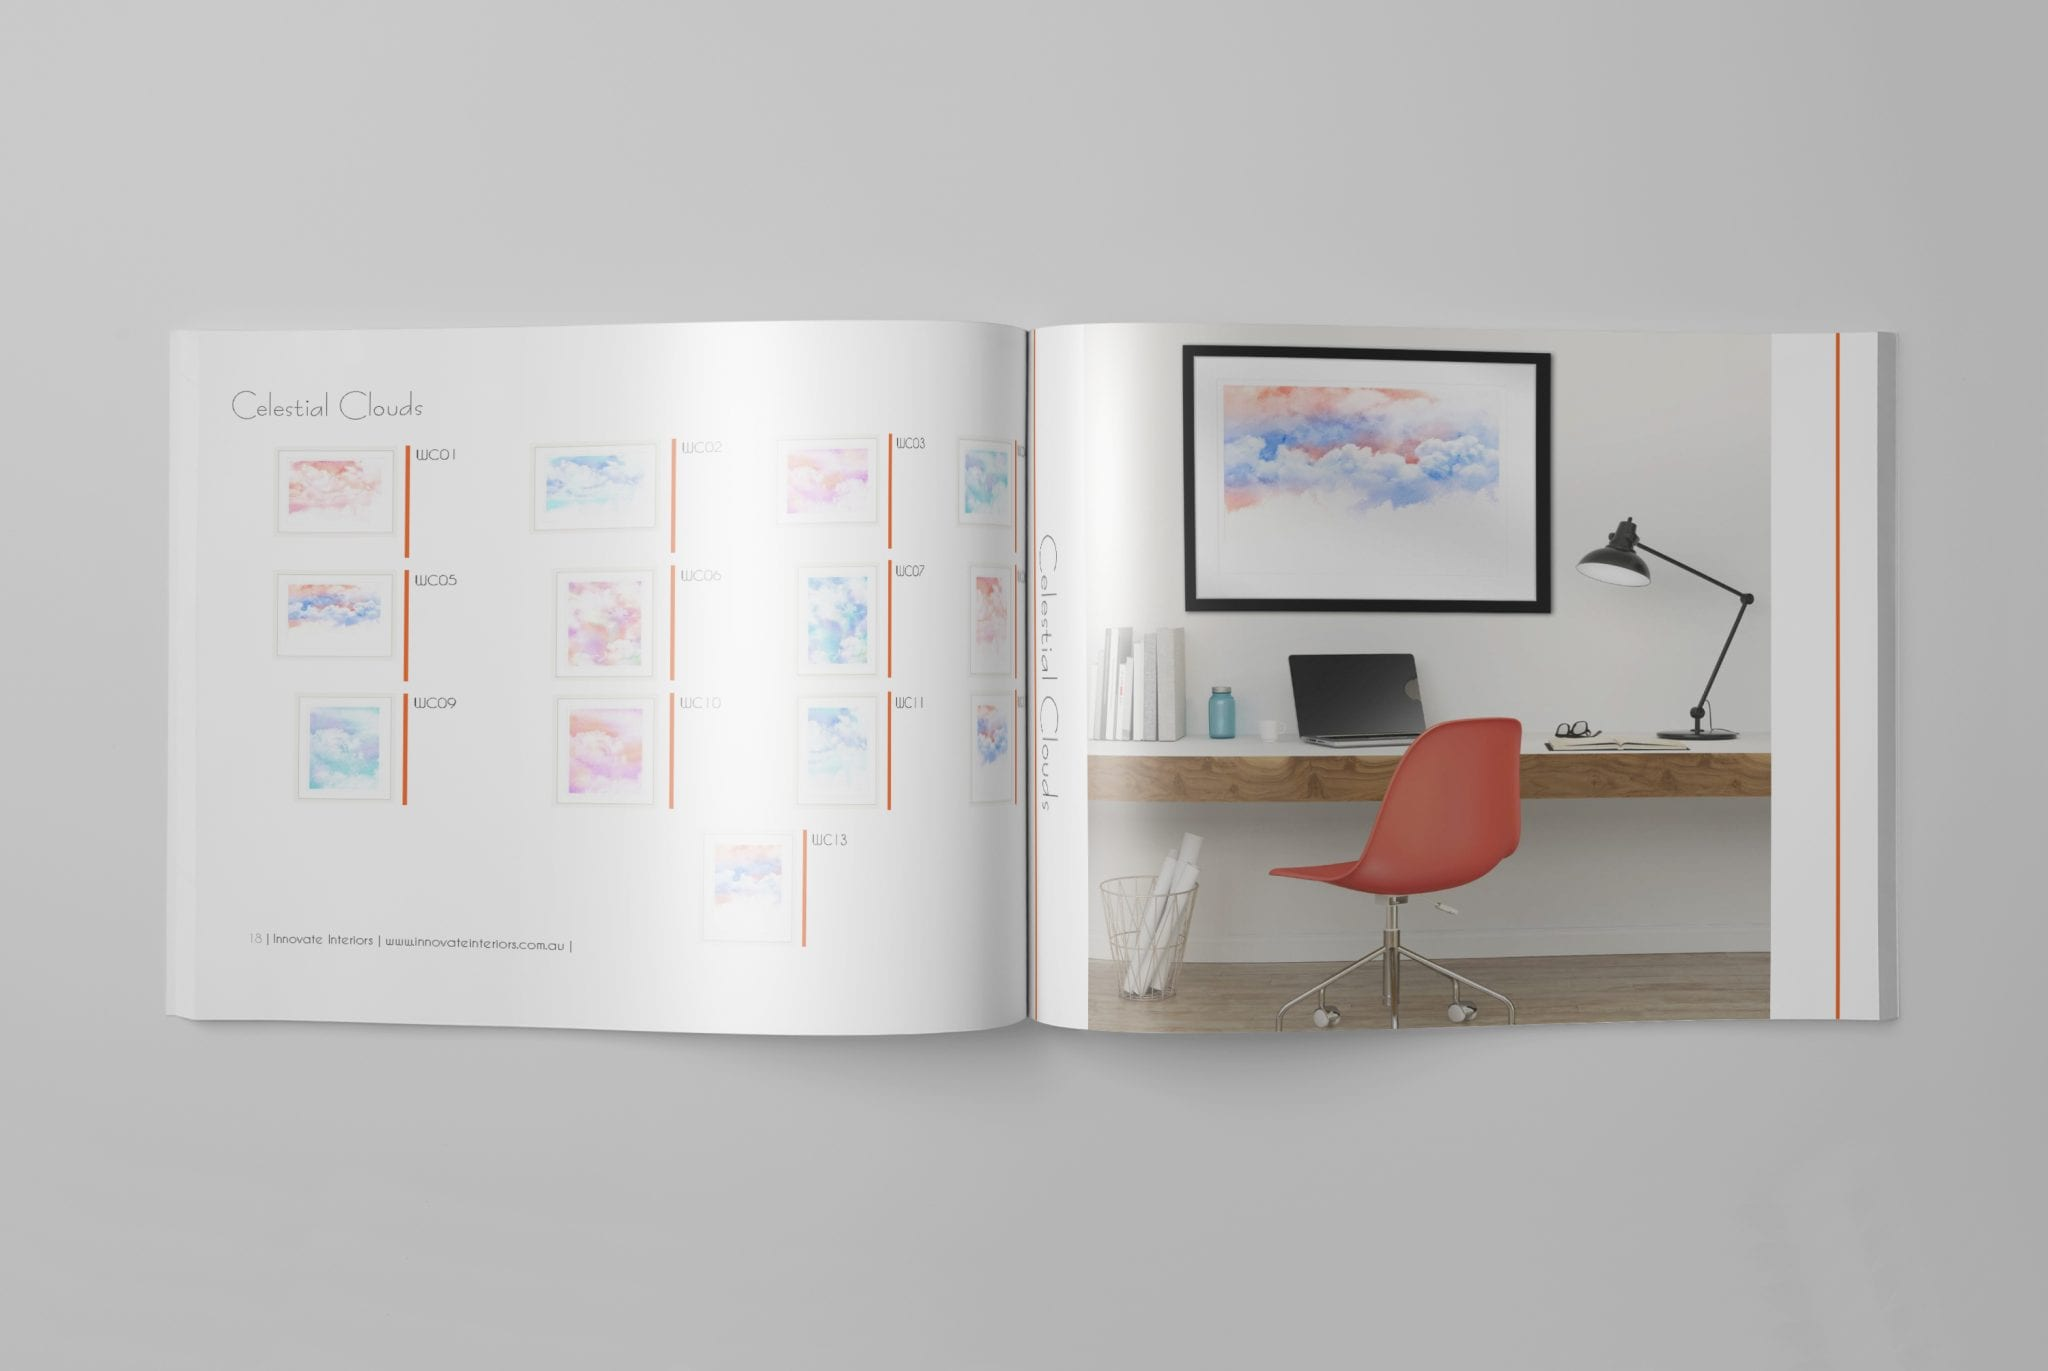 wholesale art | Framed Art | Wall Art Gold Coast | Wallpaper | Innovate Interiors